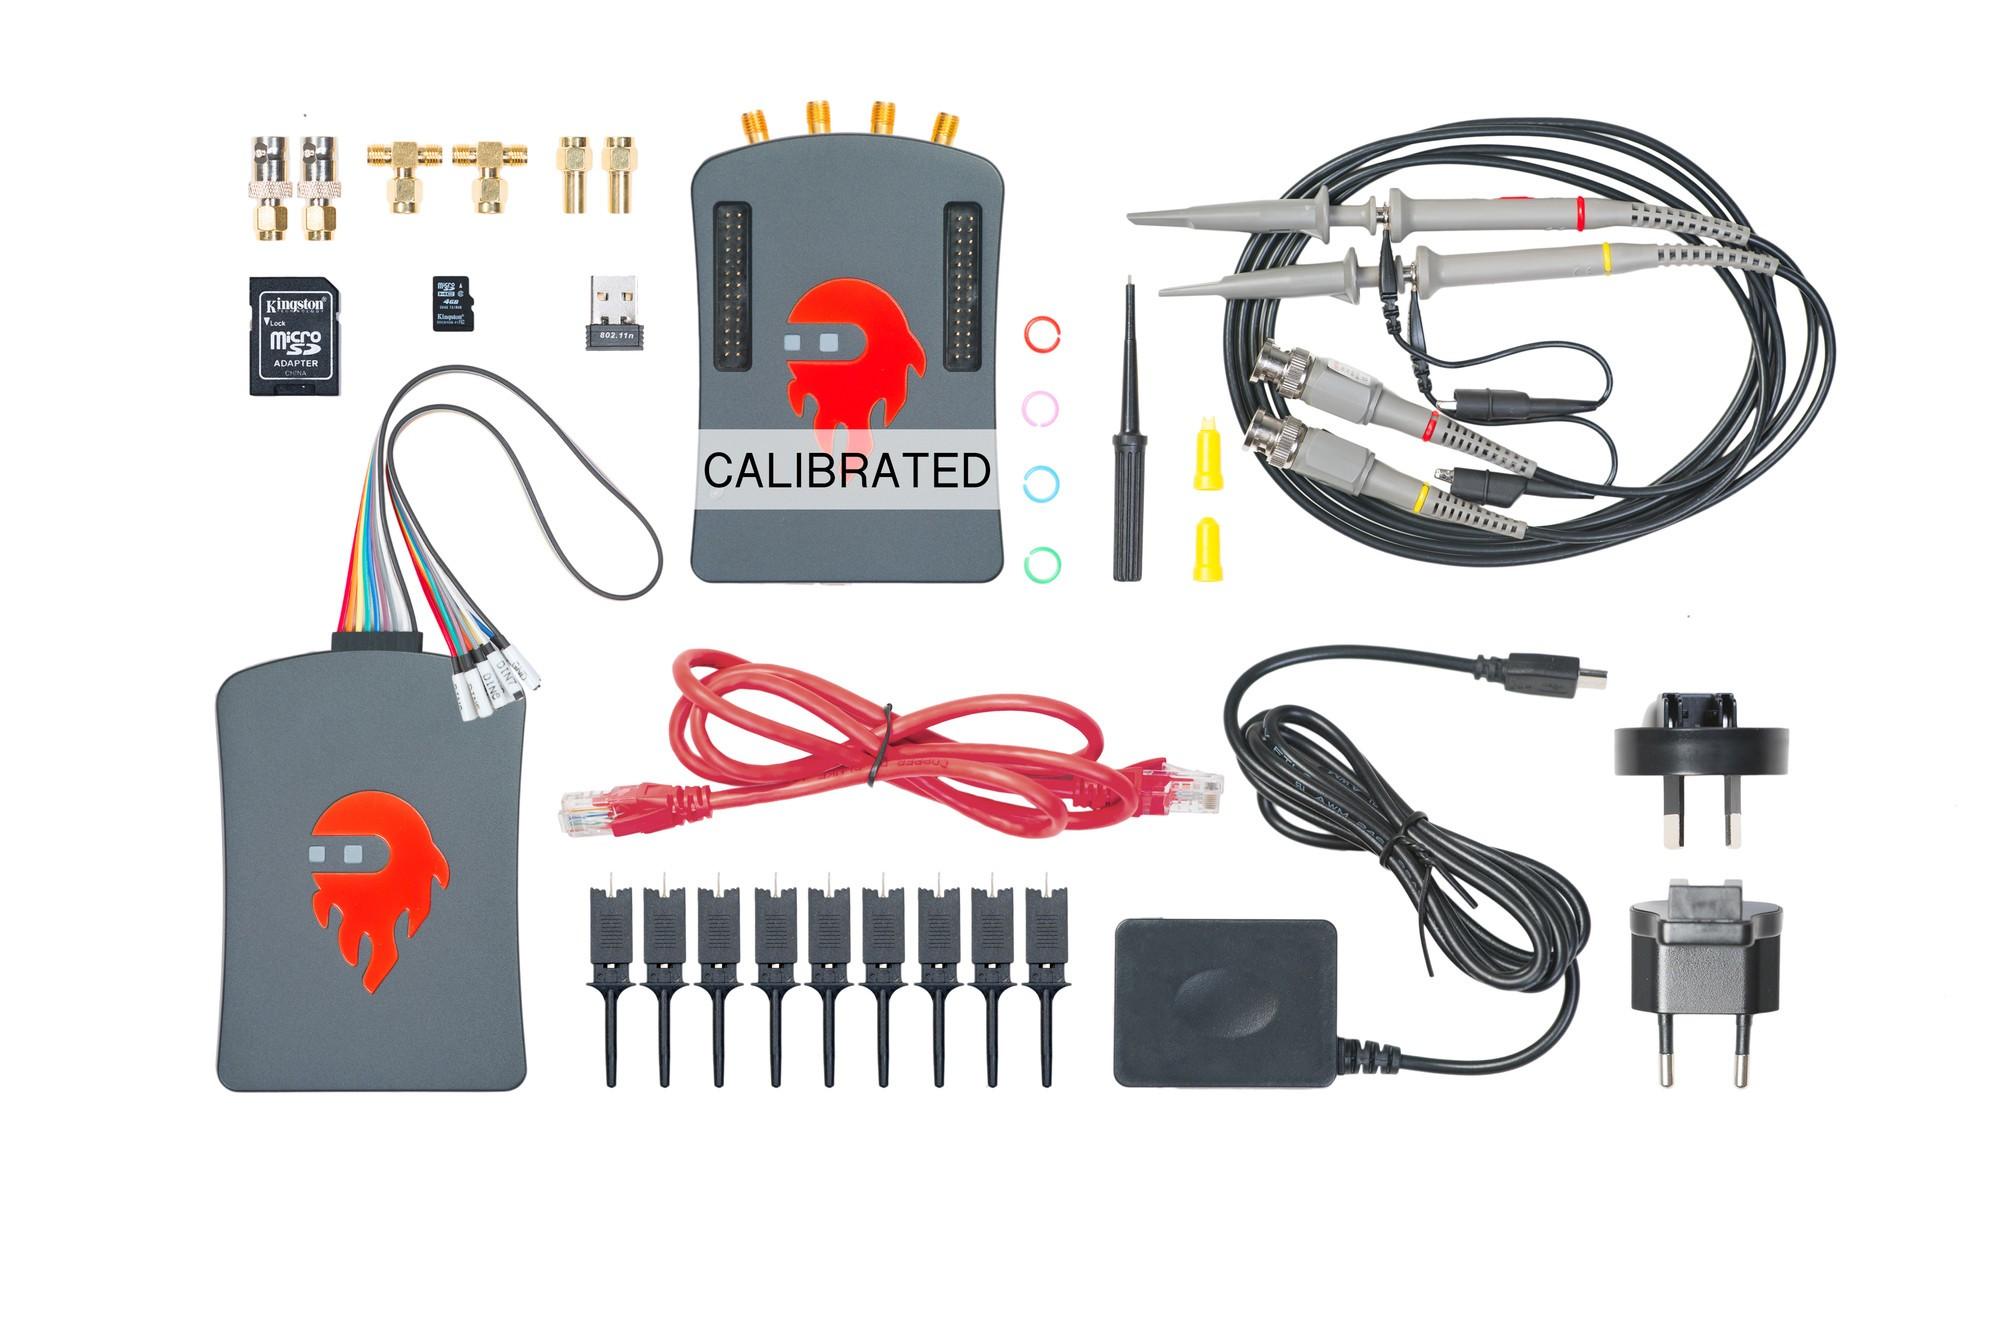 Red Pitaya V1.1 (kit de diagnostic calibré)